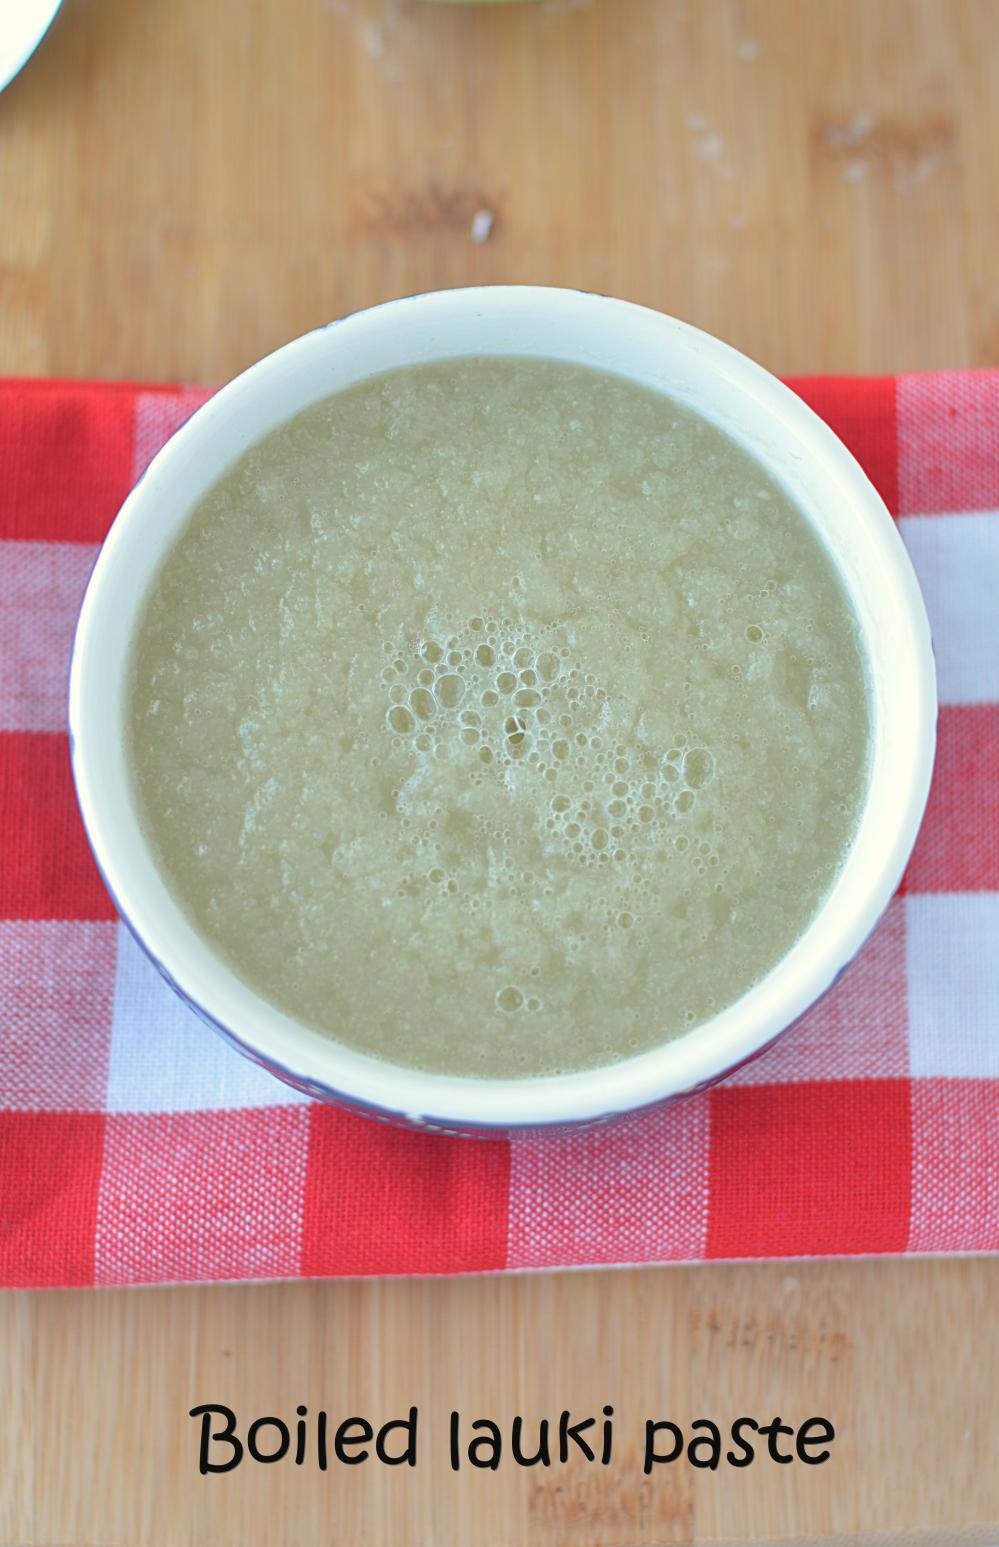 Boiled Lauki Paste